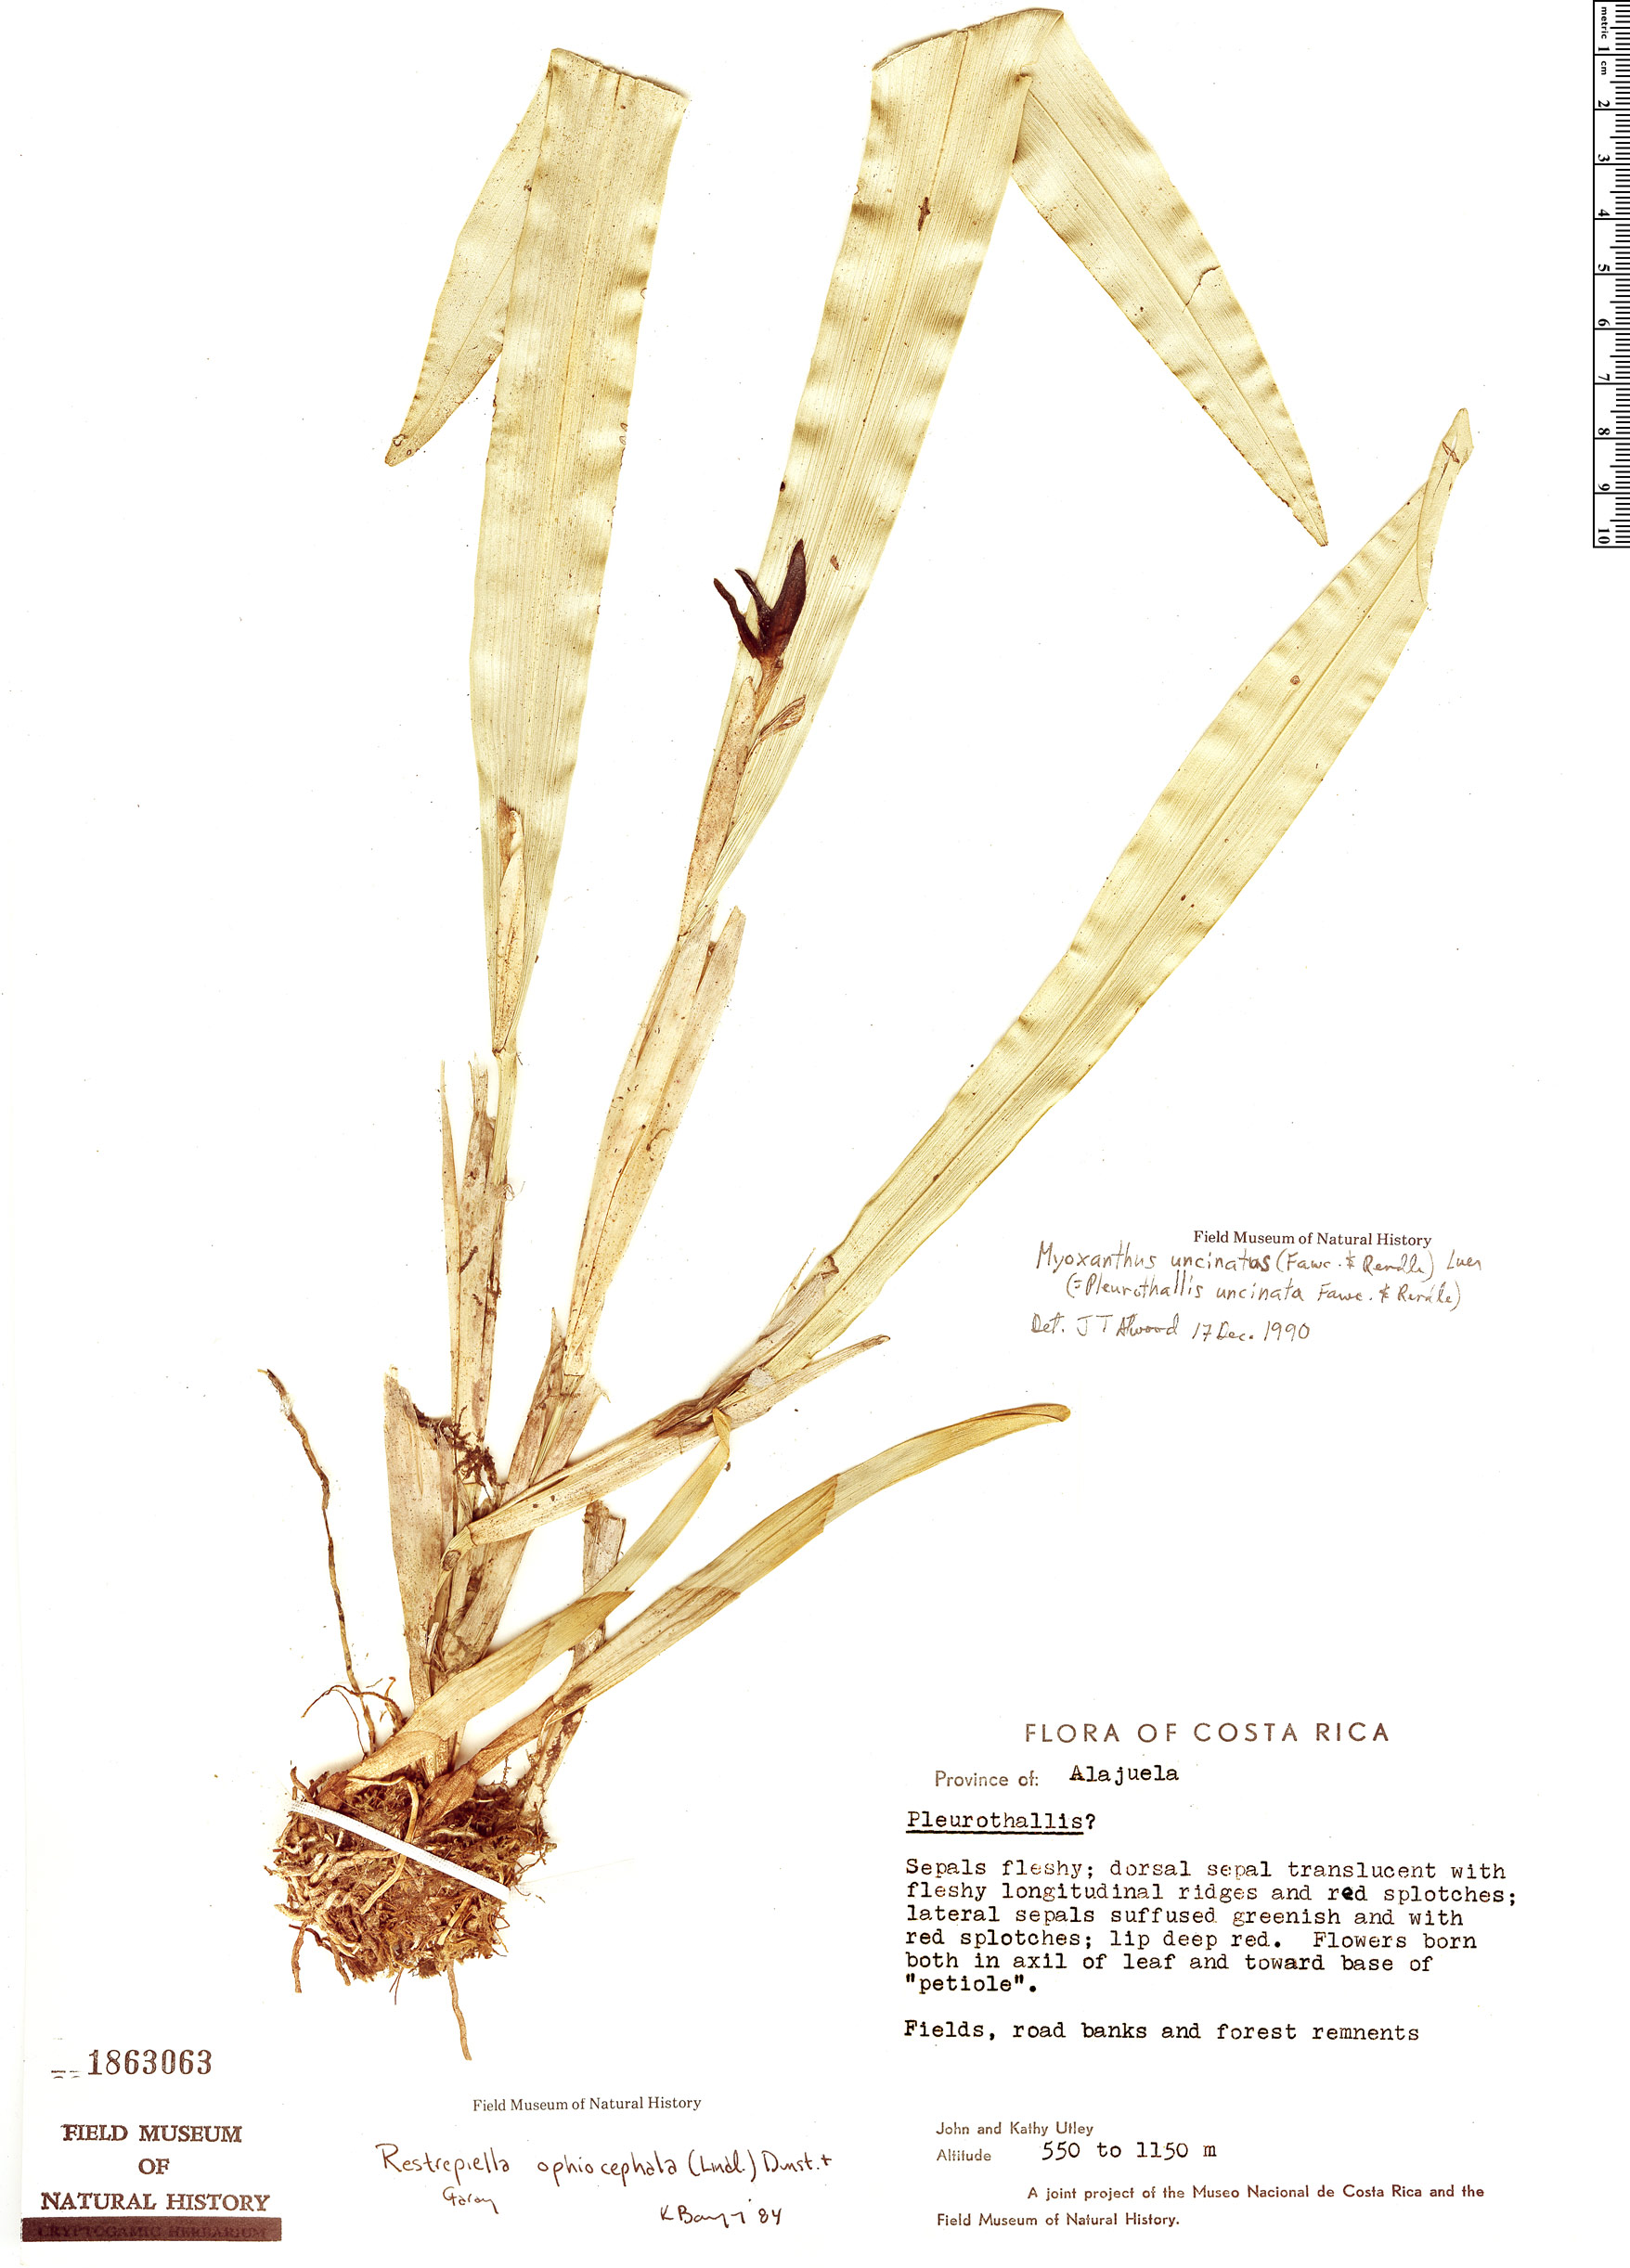 Specimen: Echinosepala uncinata